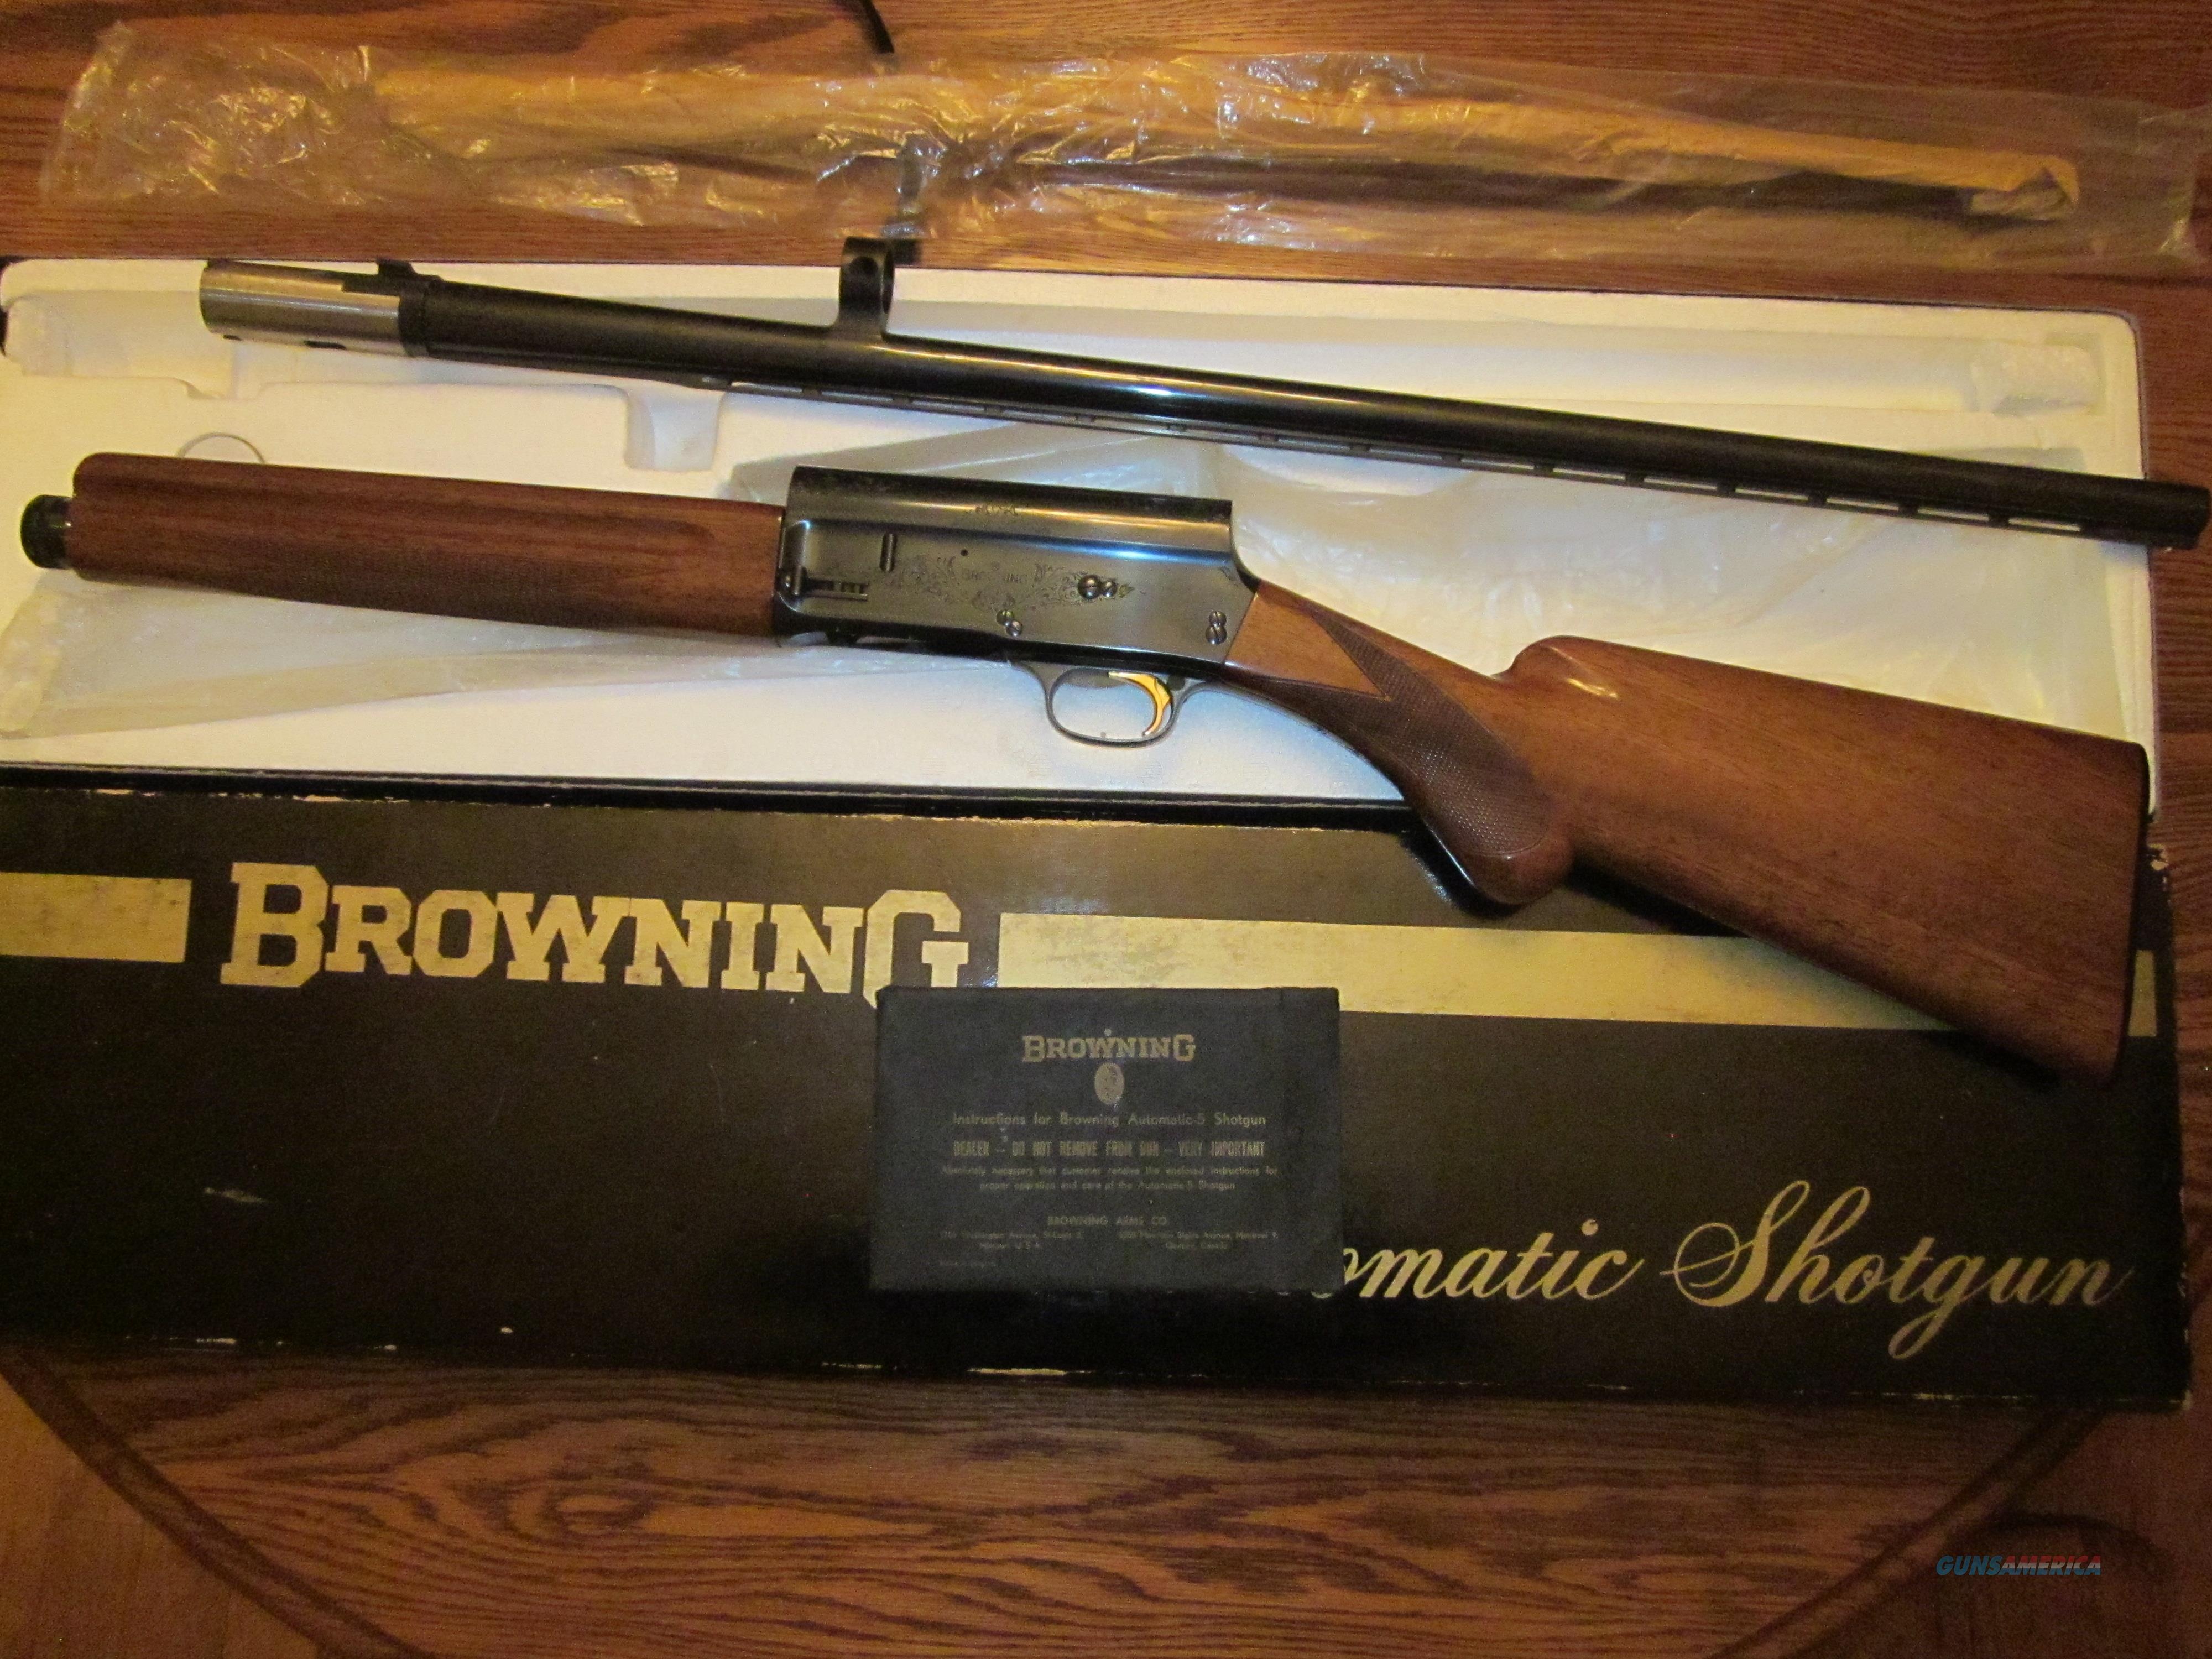 Browning Sweet 16 Belgium  Guns > Shotguns > Browning Shotguns > Autoloaders > Hunting